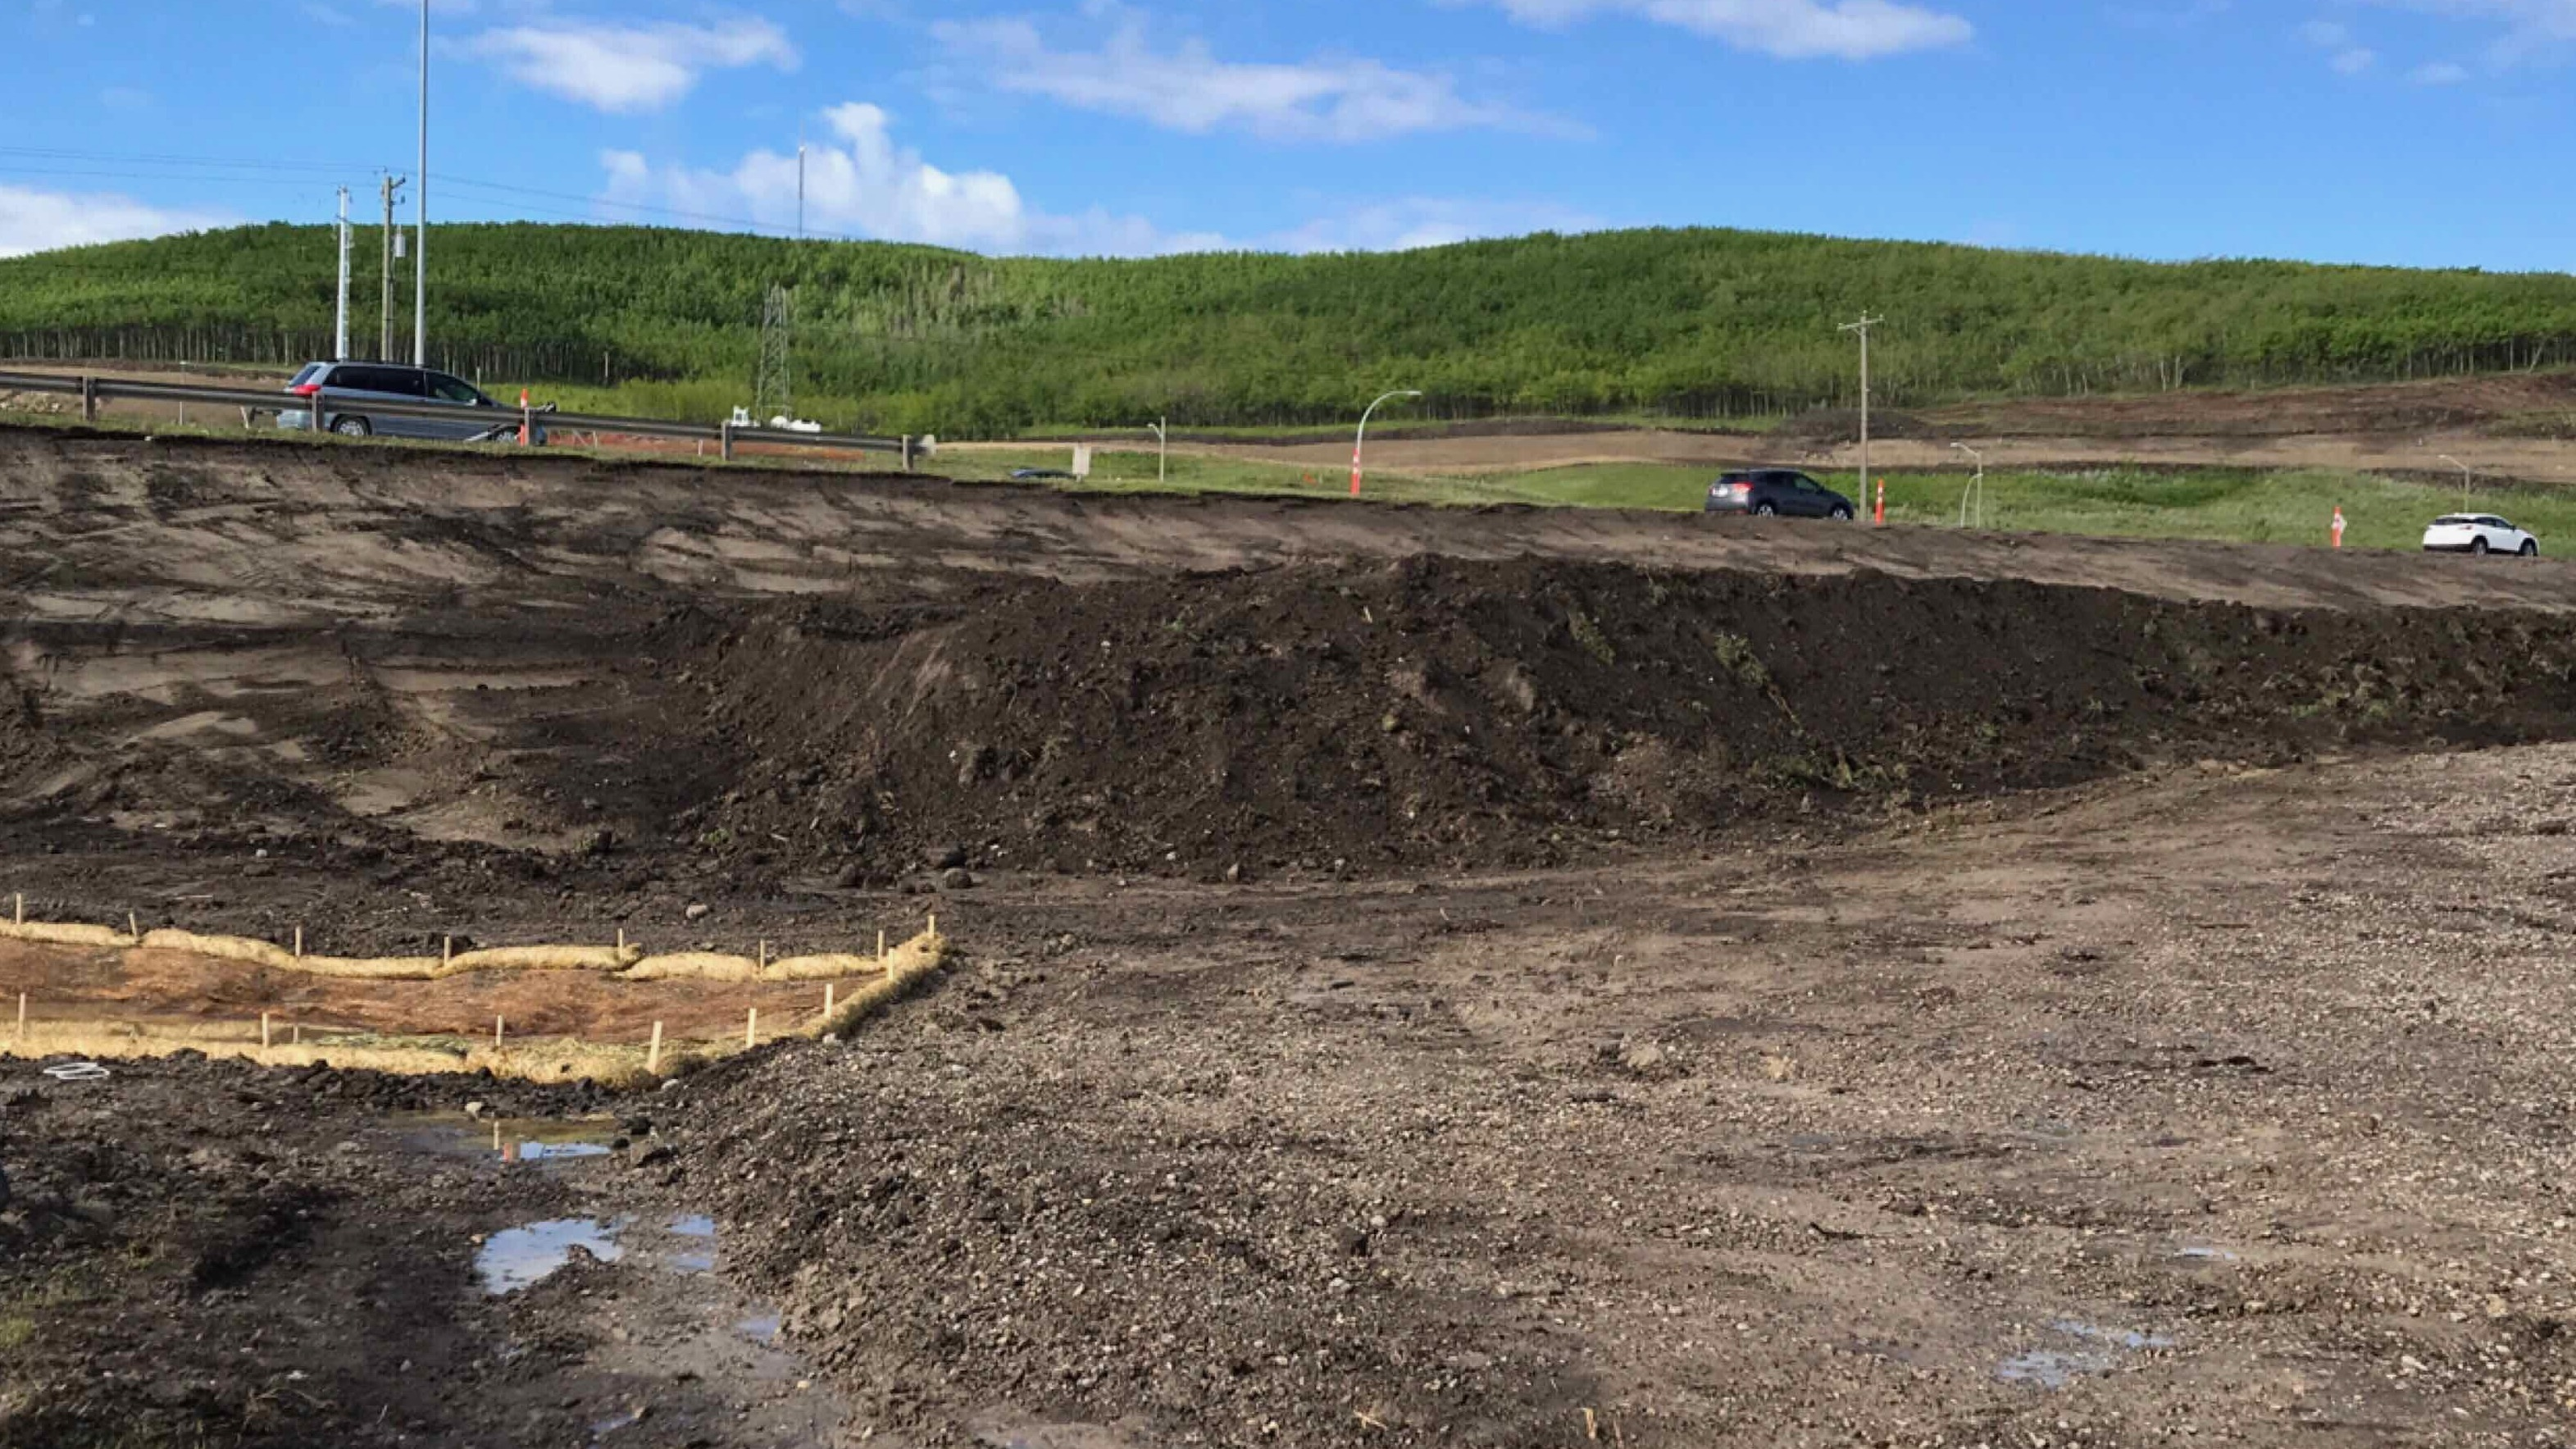 TCH topsoil stripped